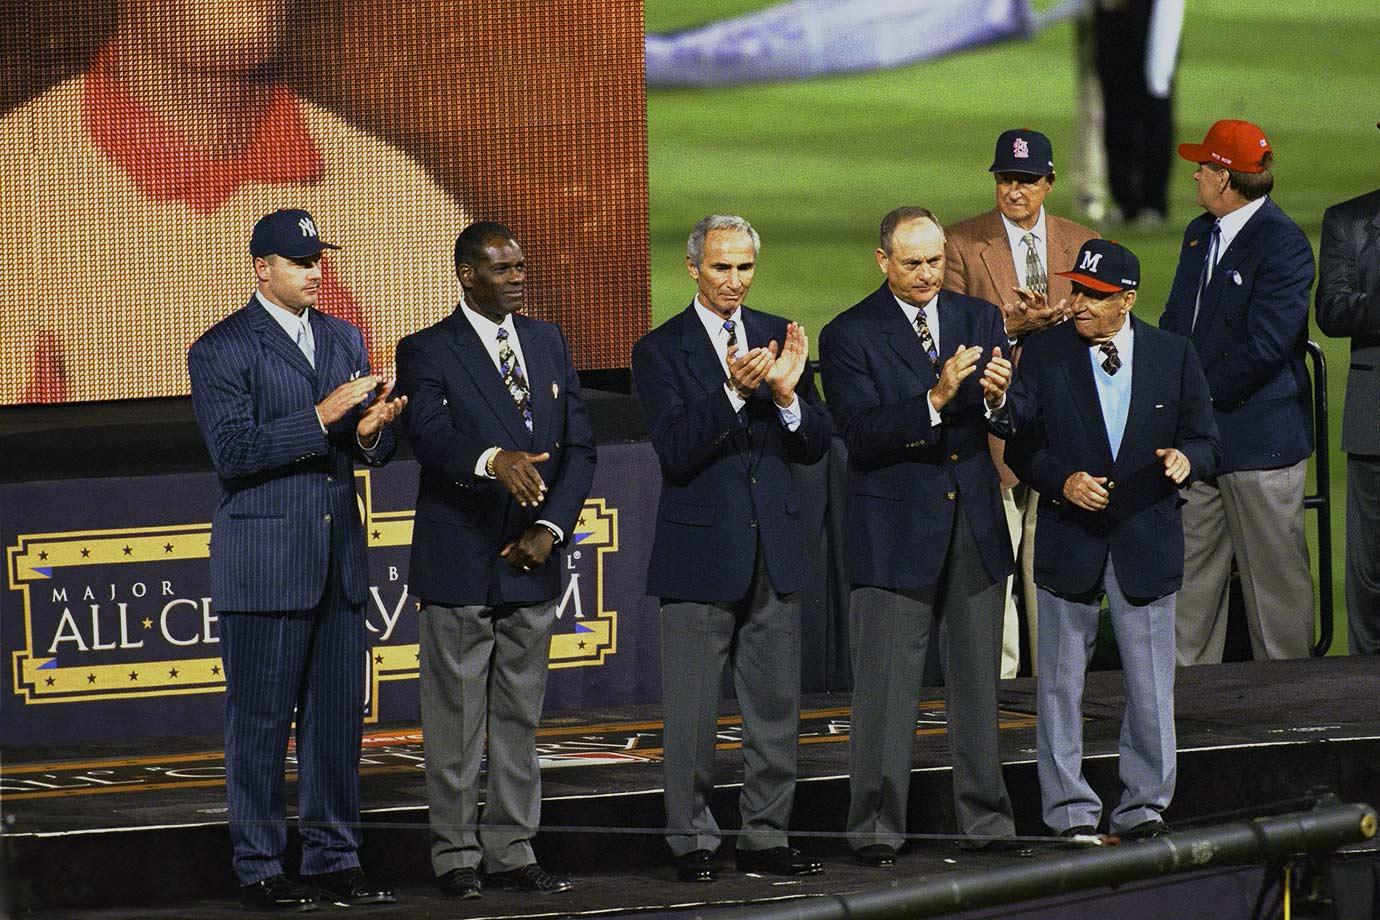 Oct. 24, 1999 — MLB All Century Team (World Series, Game 2)